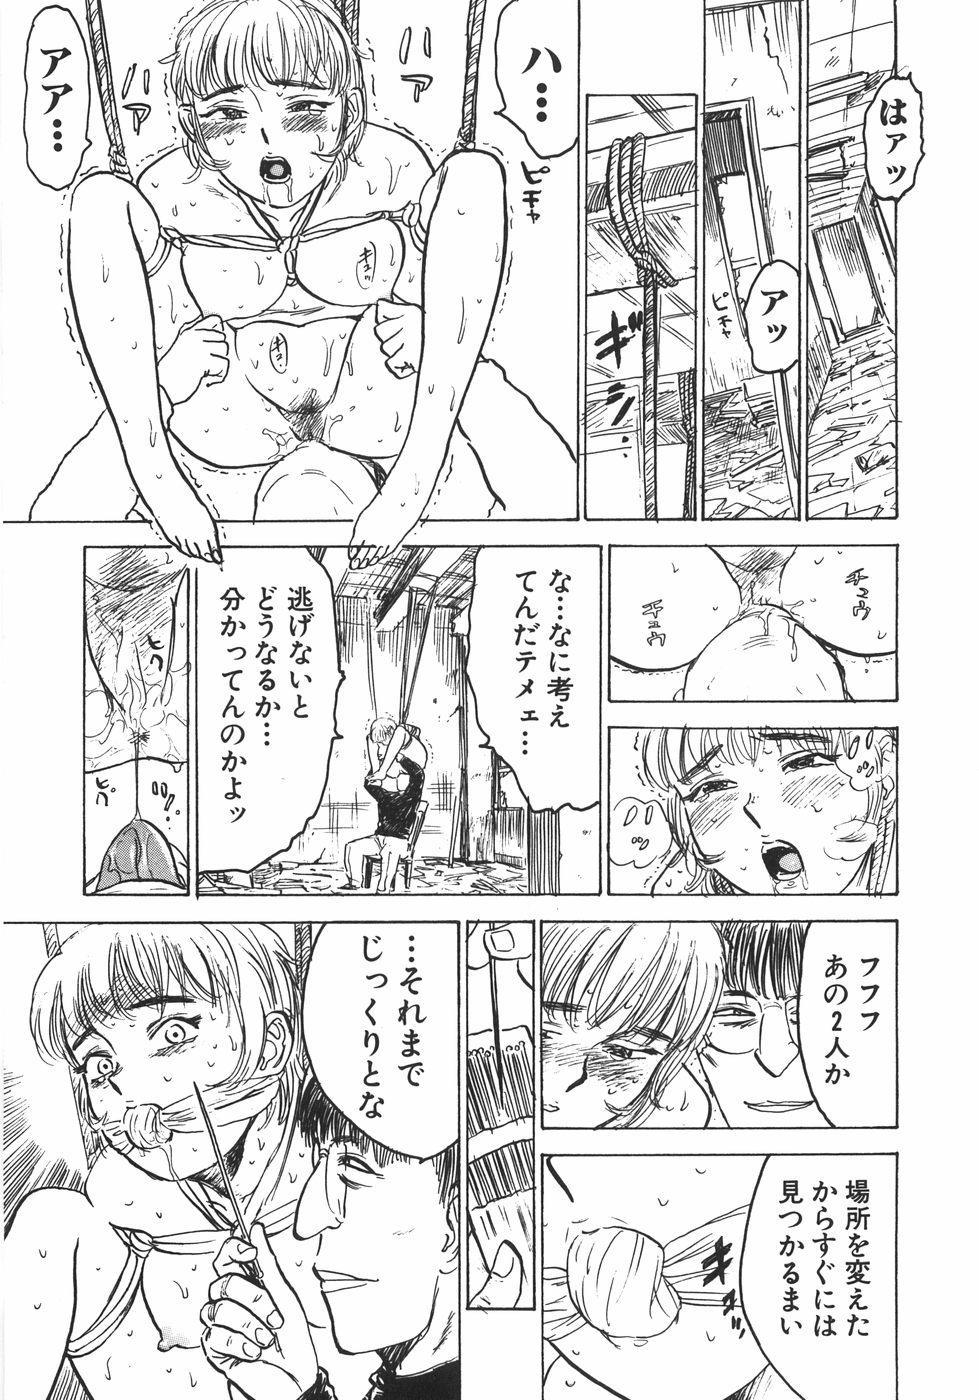 Ningyou no Yakata - The Doll House 117